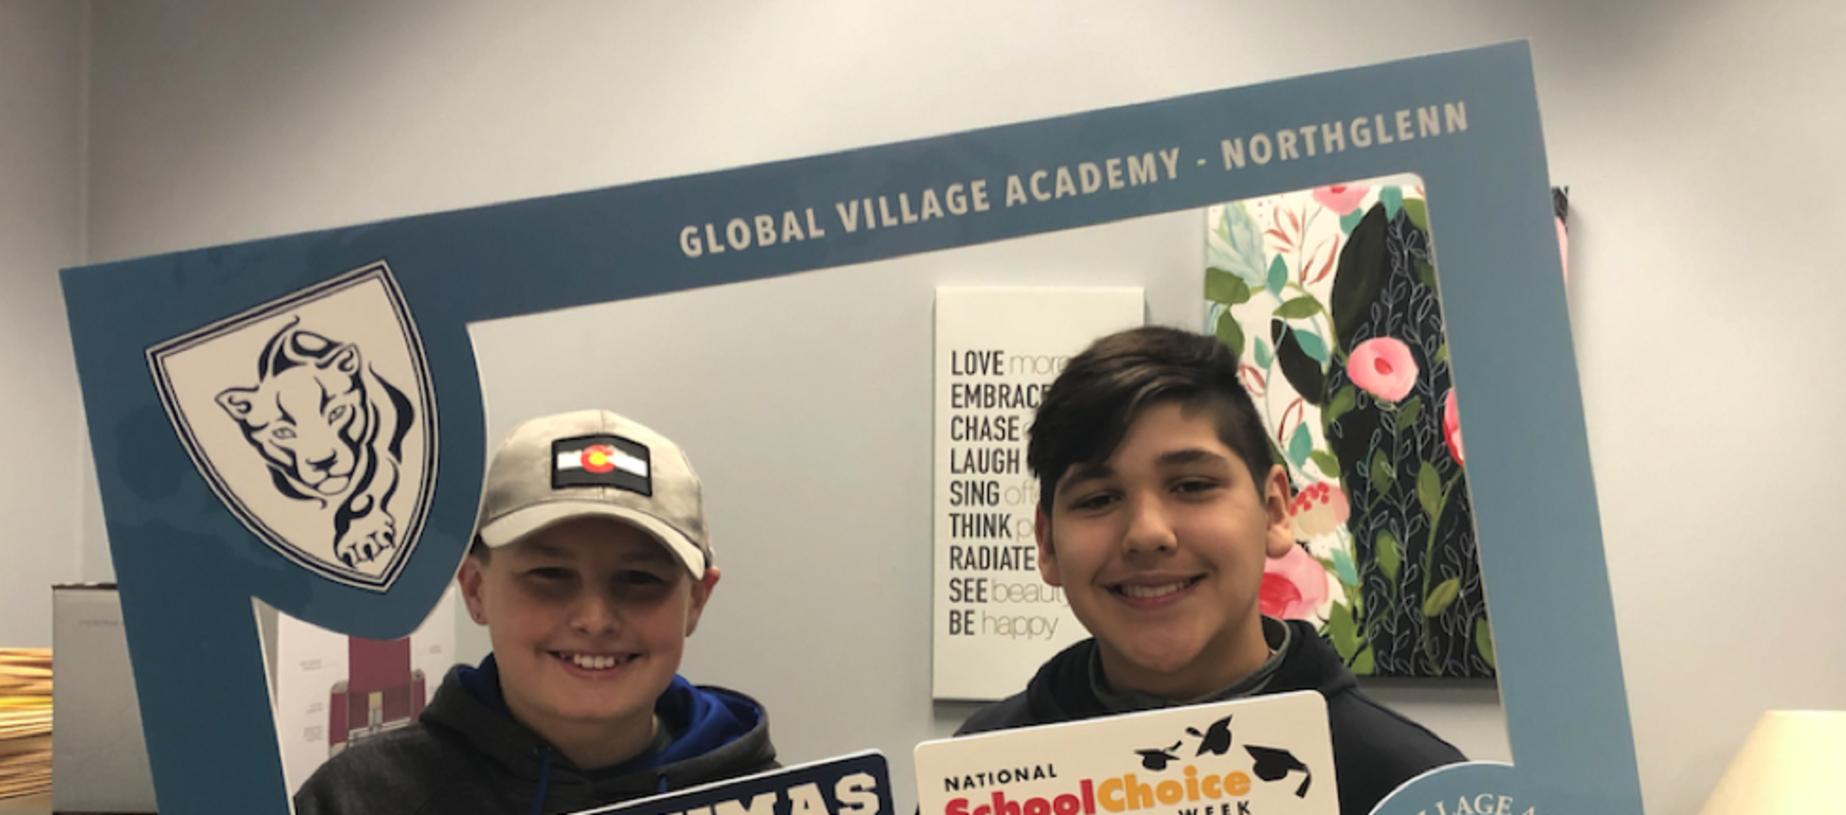 8th Graders Puma Proud National School Choice Week